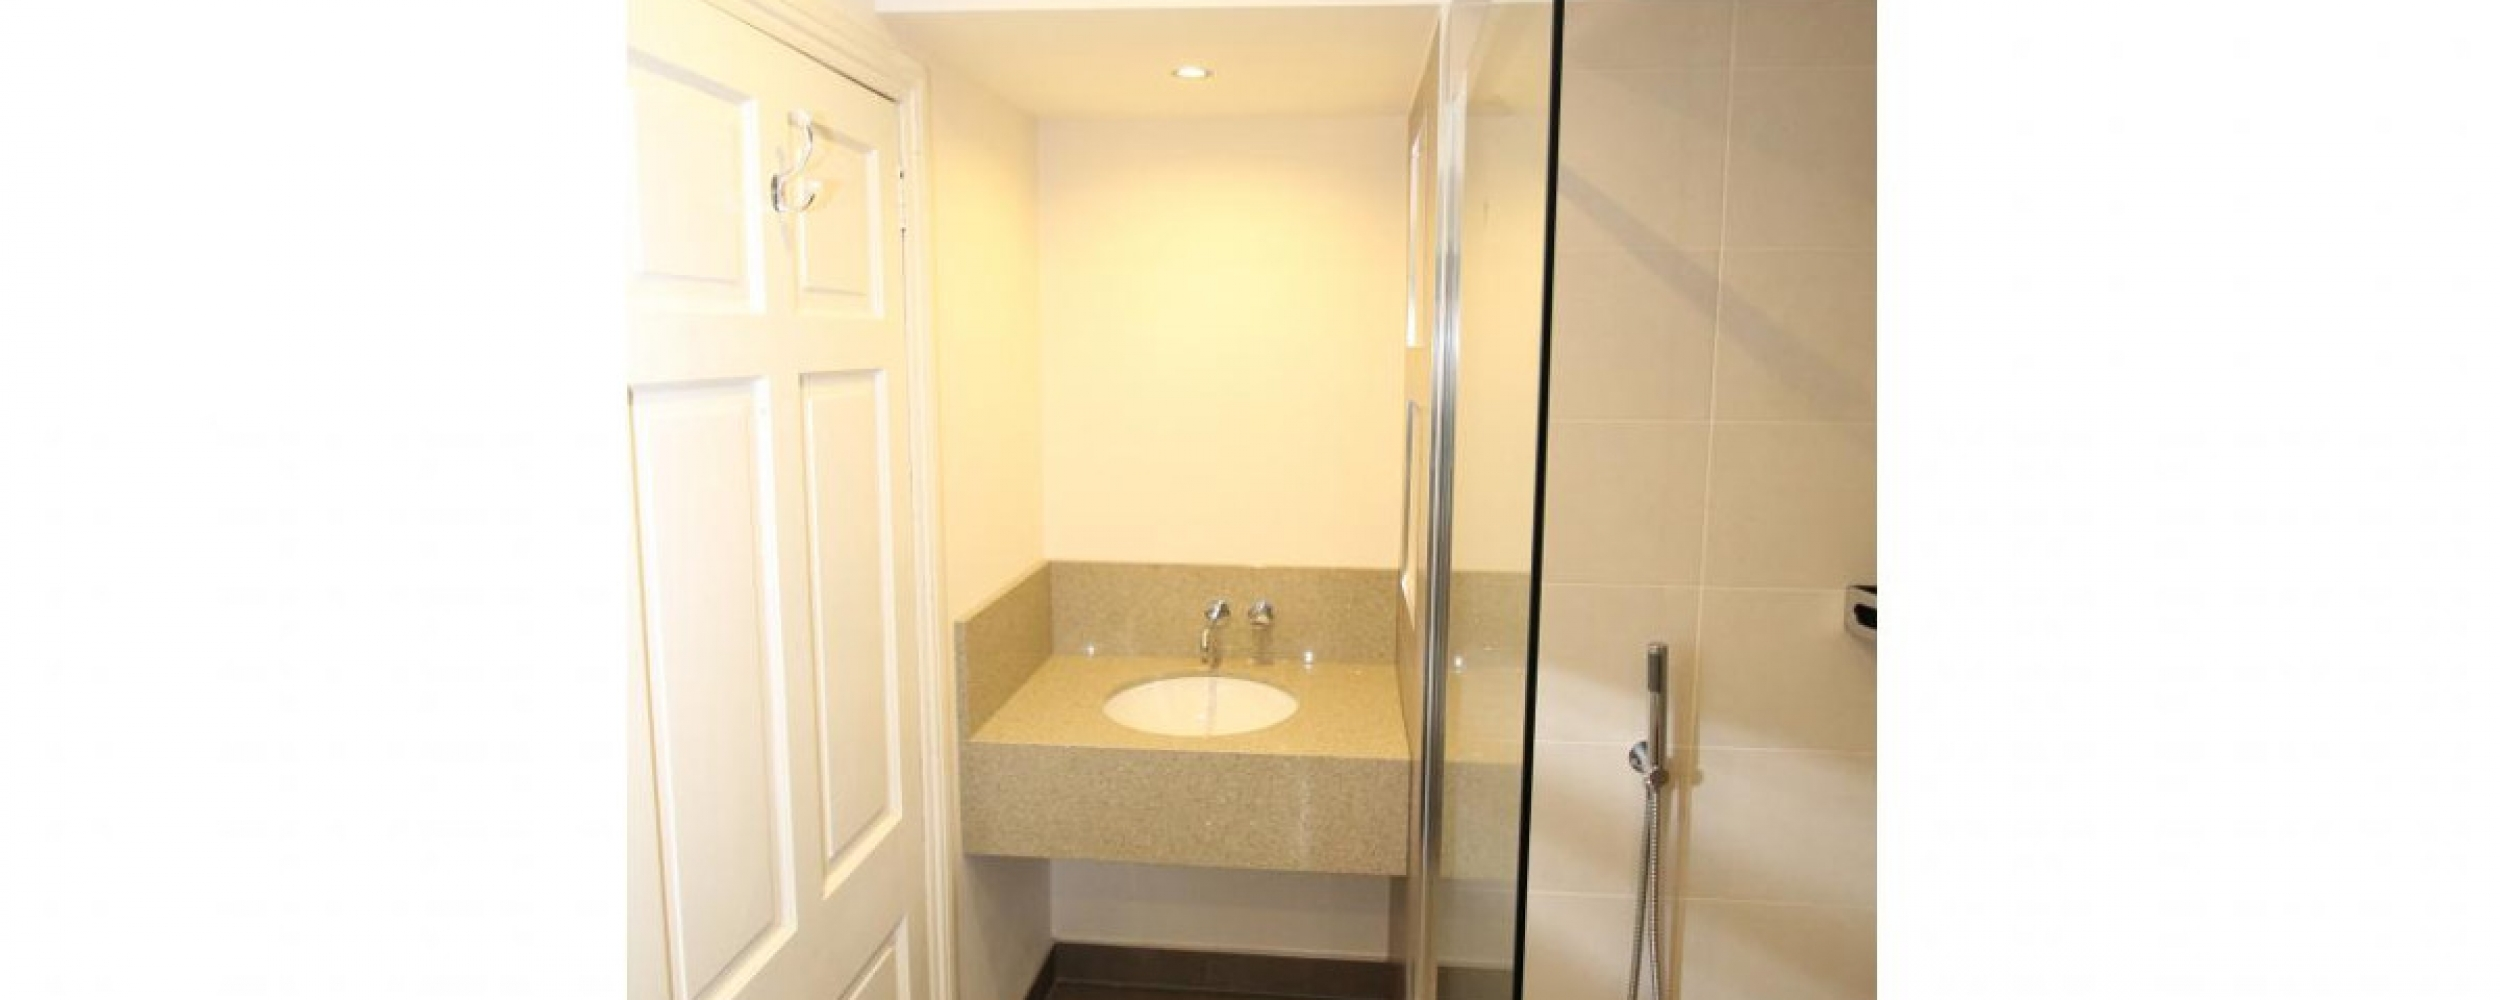 Mr mrs pollock guest bathroom ekco for Ekco bathrooms